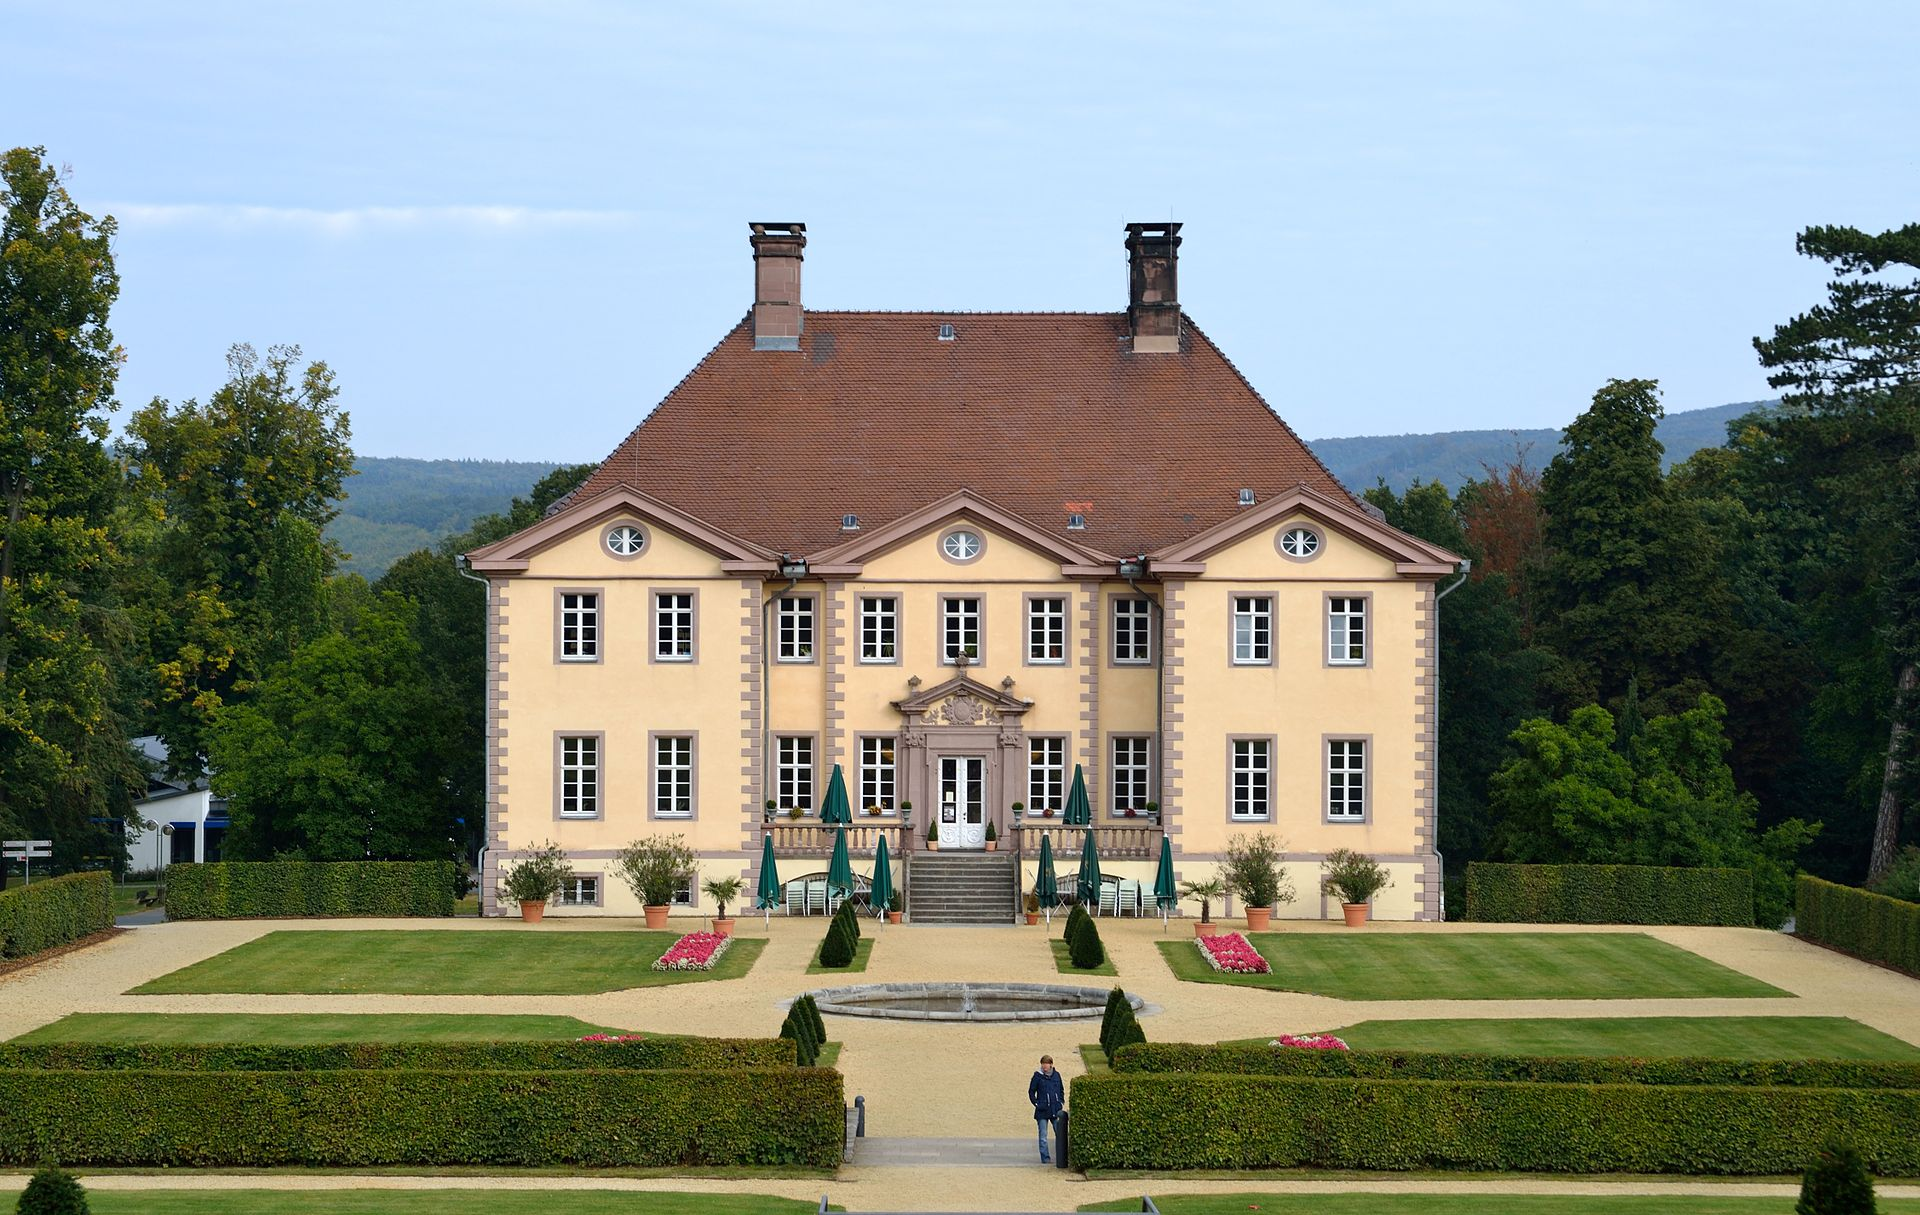 Bild Schloss Schieder